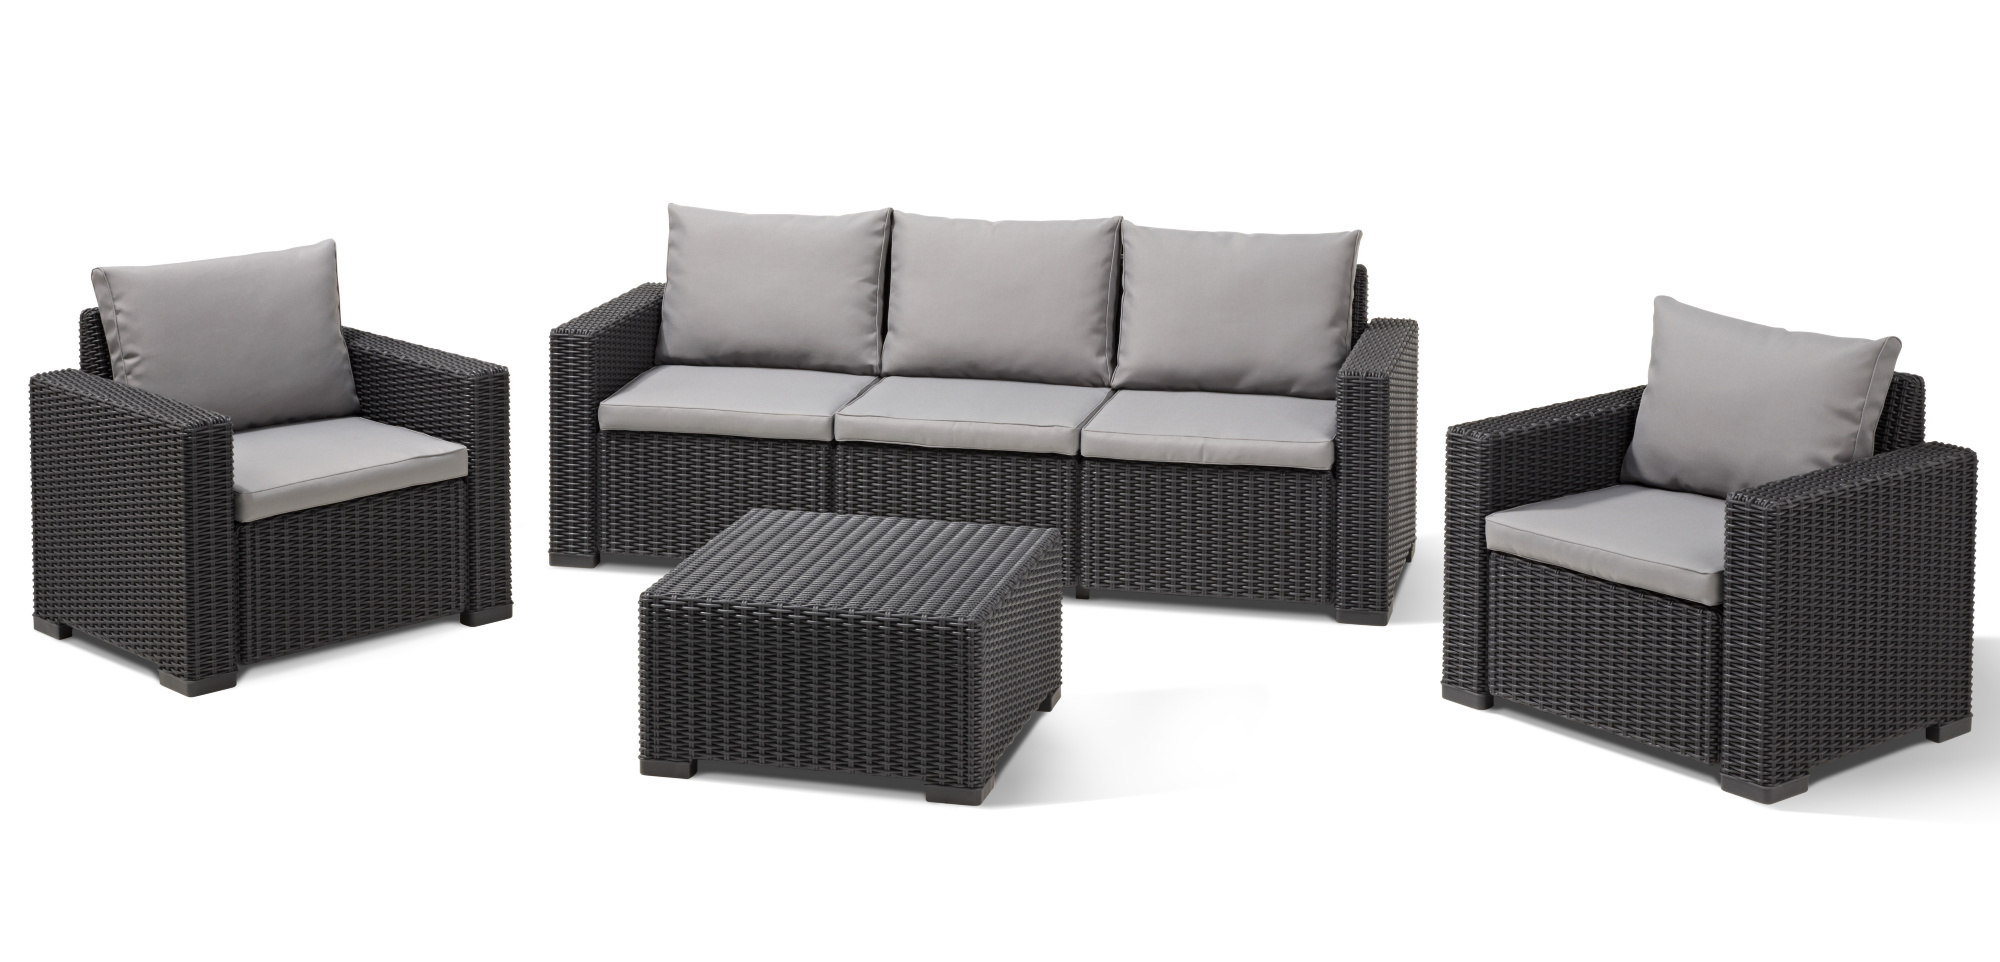 Allibert california lounge set graphite three seater - Photo salon de jardin ...